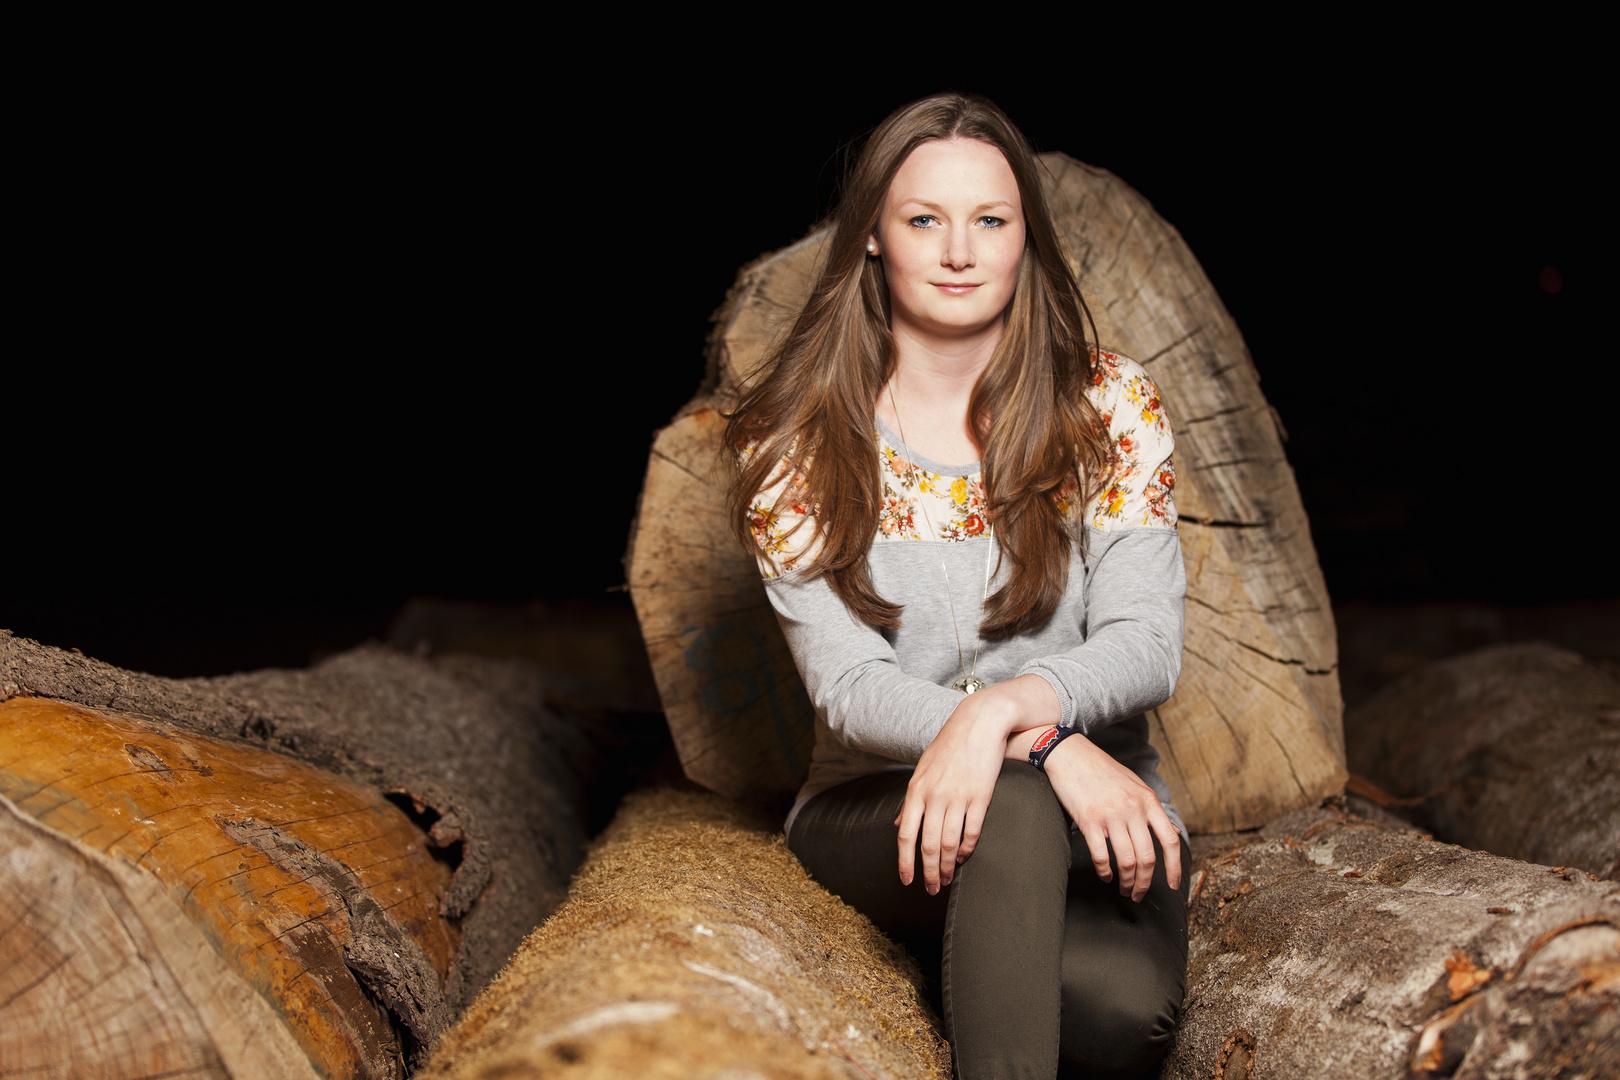 Amelie auf dem Holzstapel